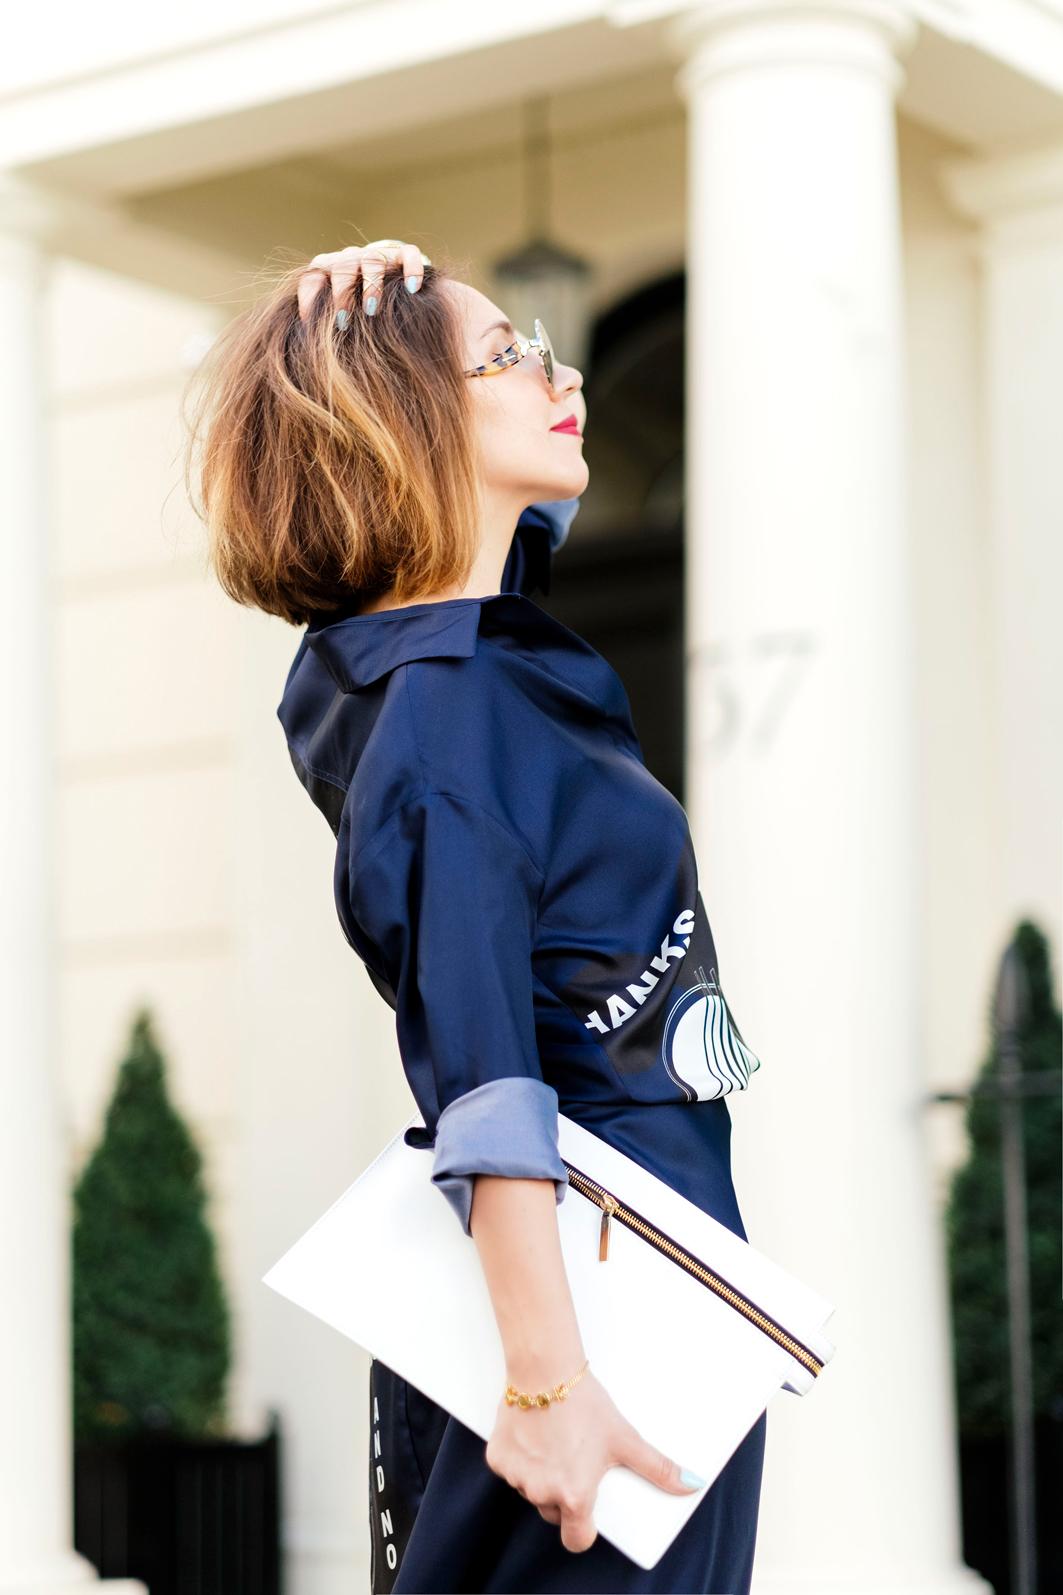 7 More Minutes. Fashion, travel and lifestyle blog by Alyona Gasimova. Что Одеть На Работу Этим Летом. www.7moreminutes.com